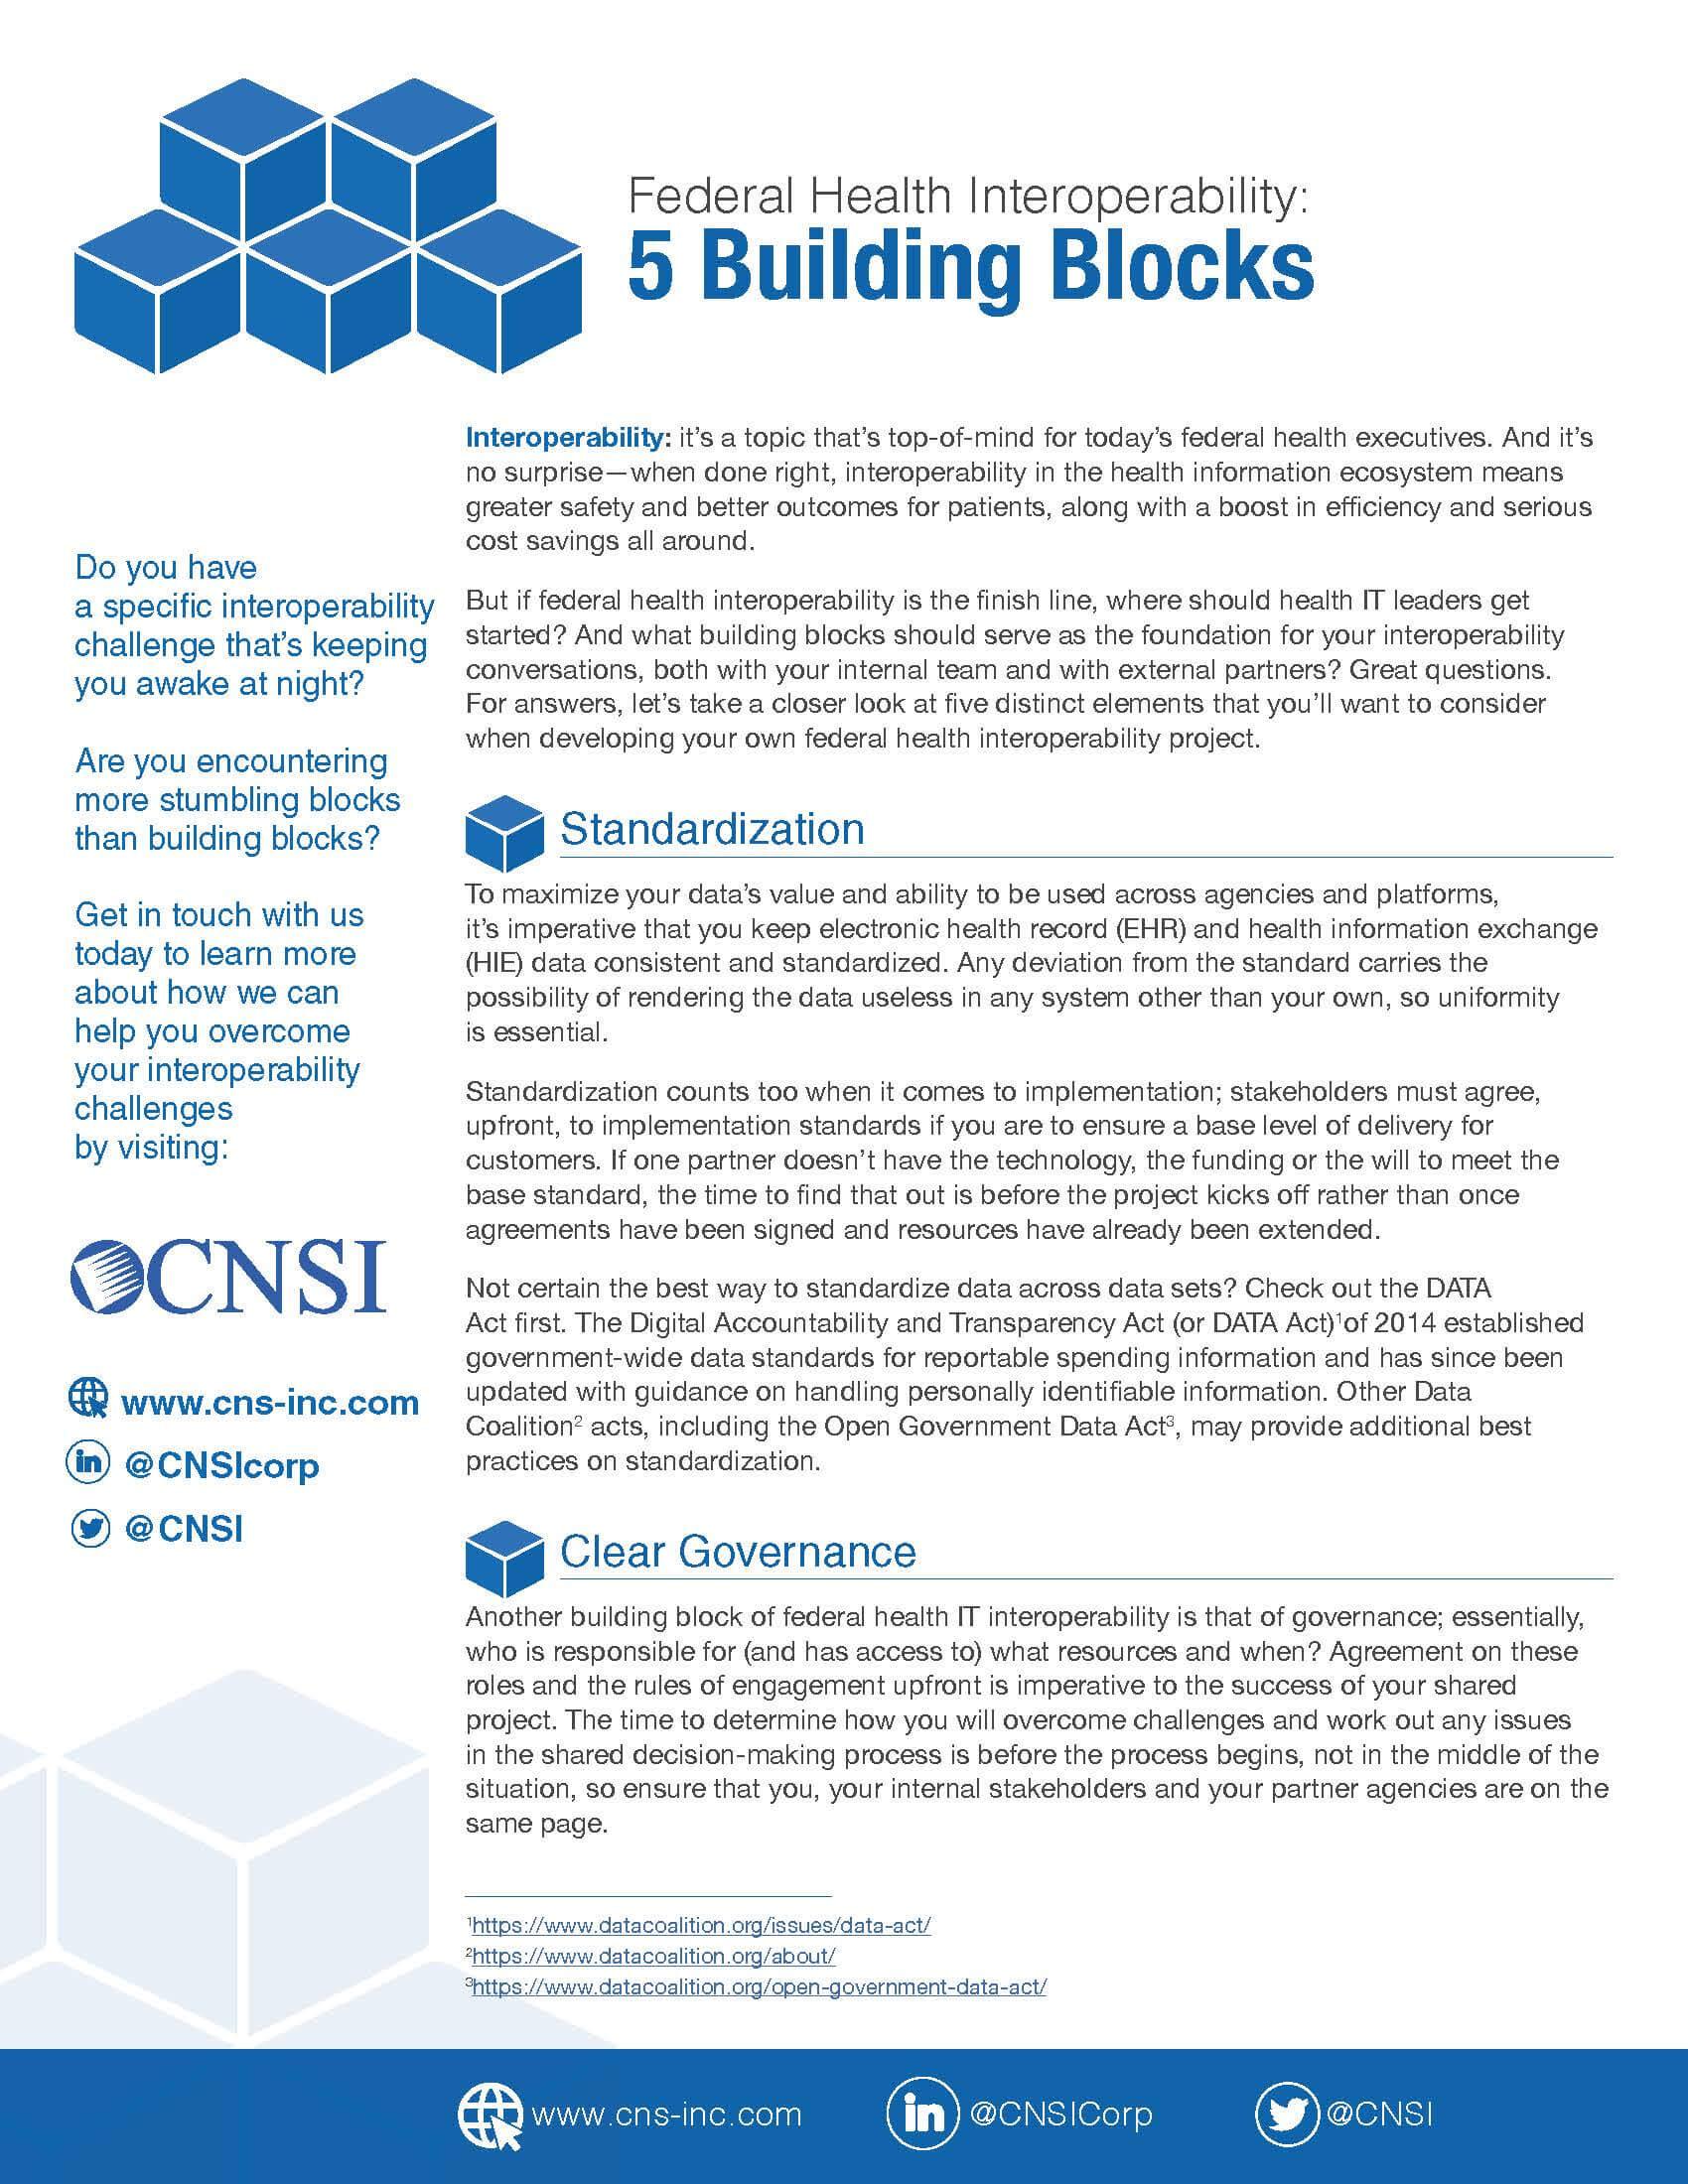 Federal Health Interoperability: 5 Building Blocks